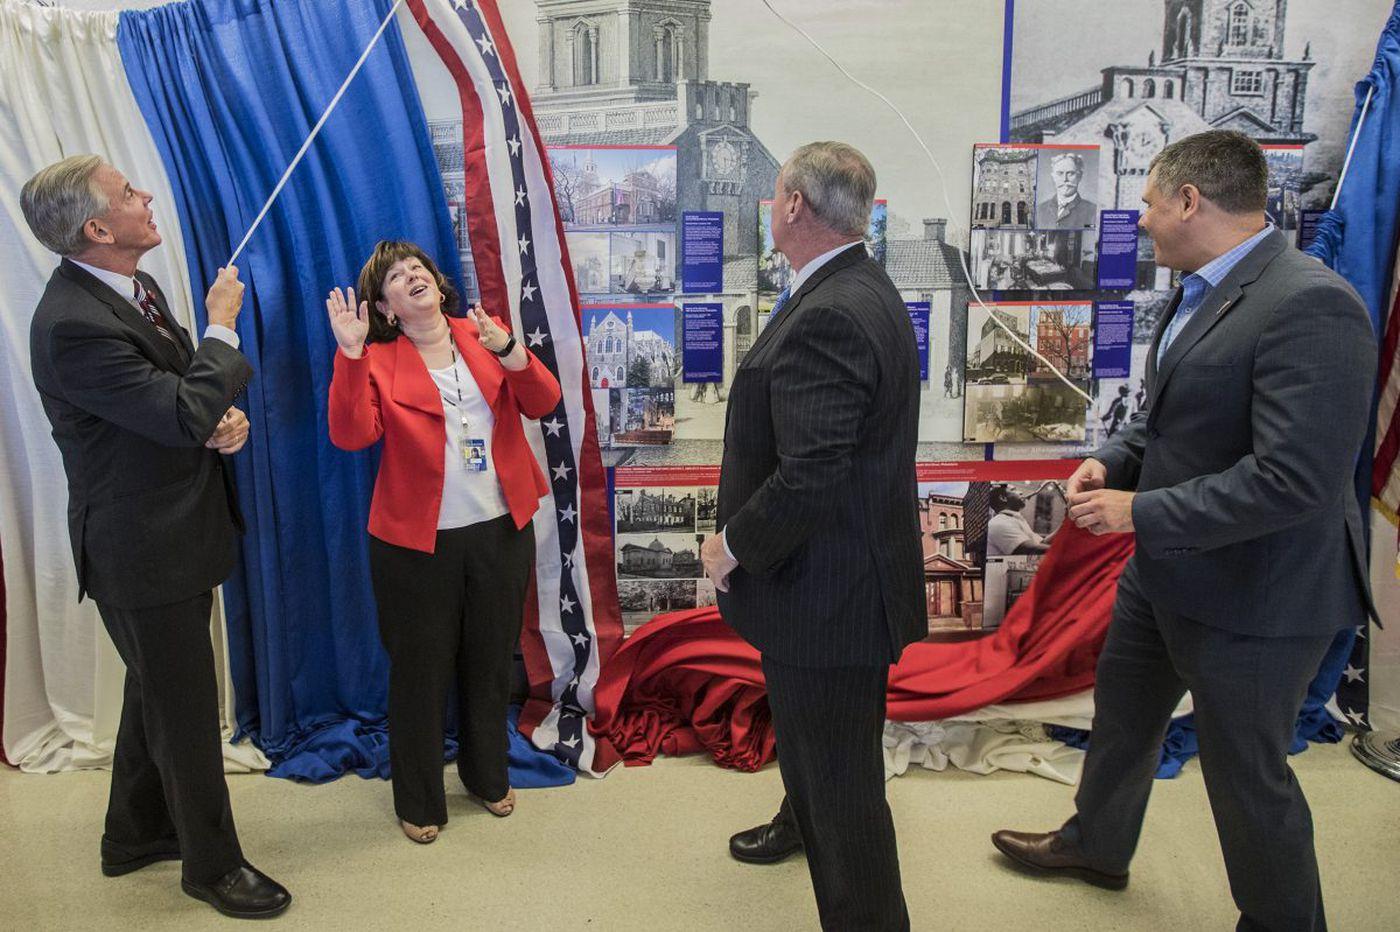 Philadelphia Airport shows off the city's 67 National Historic Landmarks